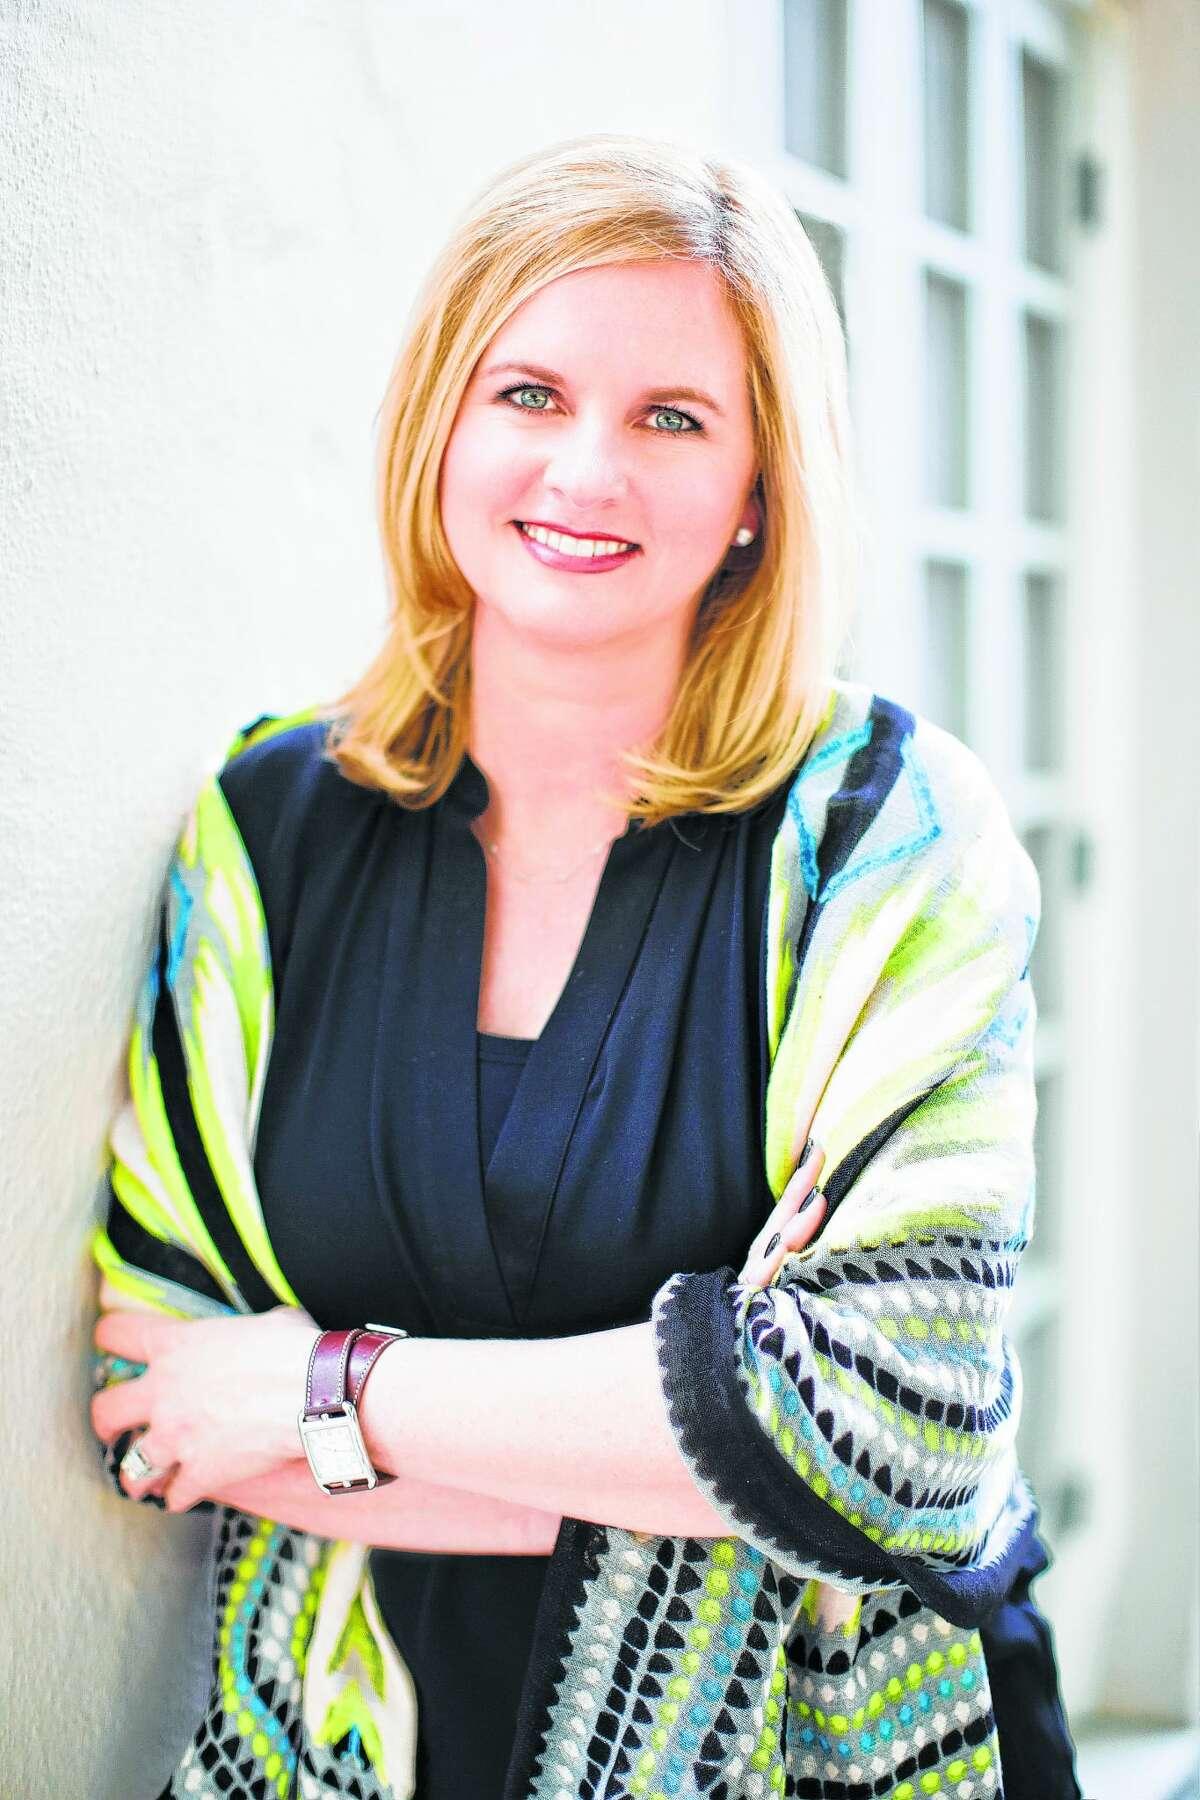 Custom homebuilder Lisa Nichols started Nic Abbey Luxury Homes by Lisa Nichols in 2002.